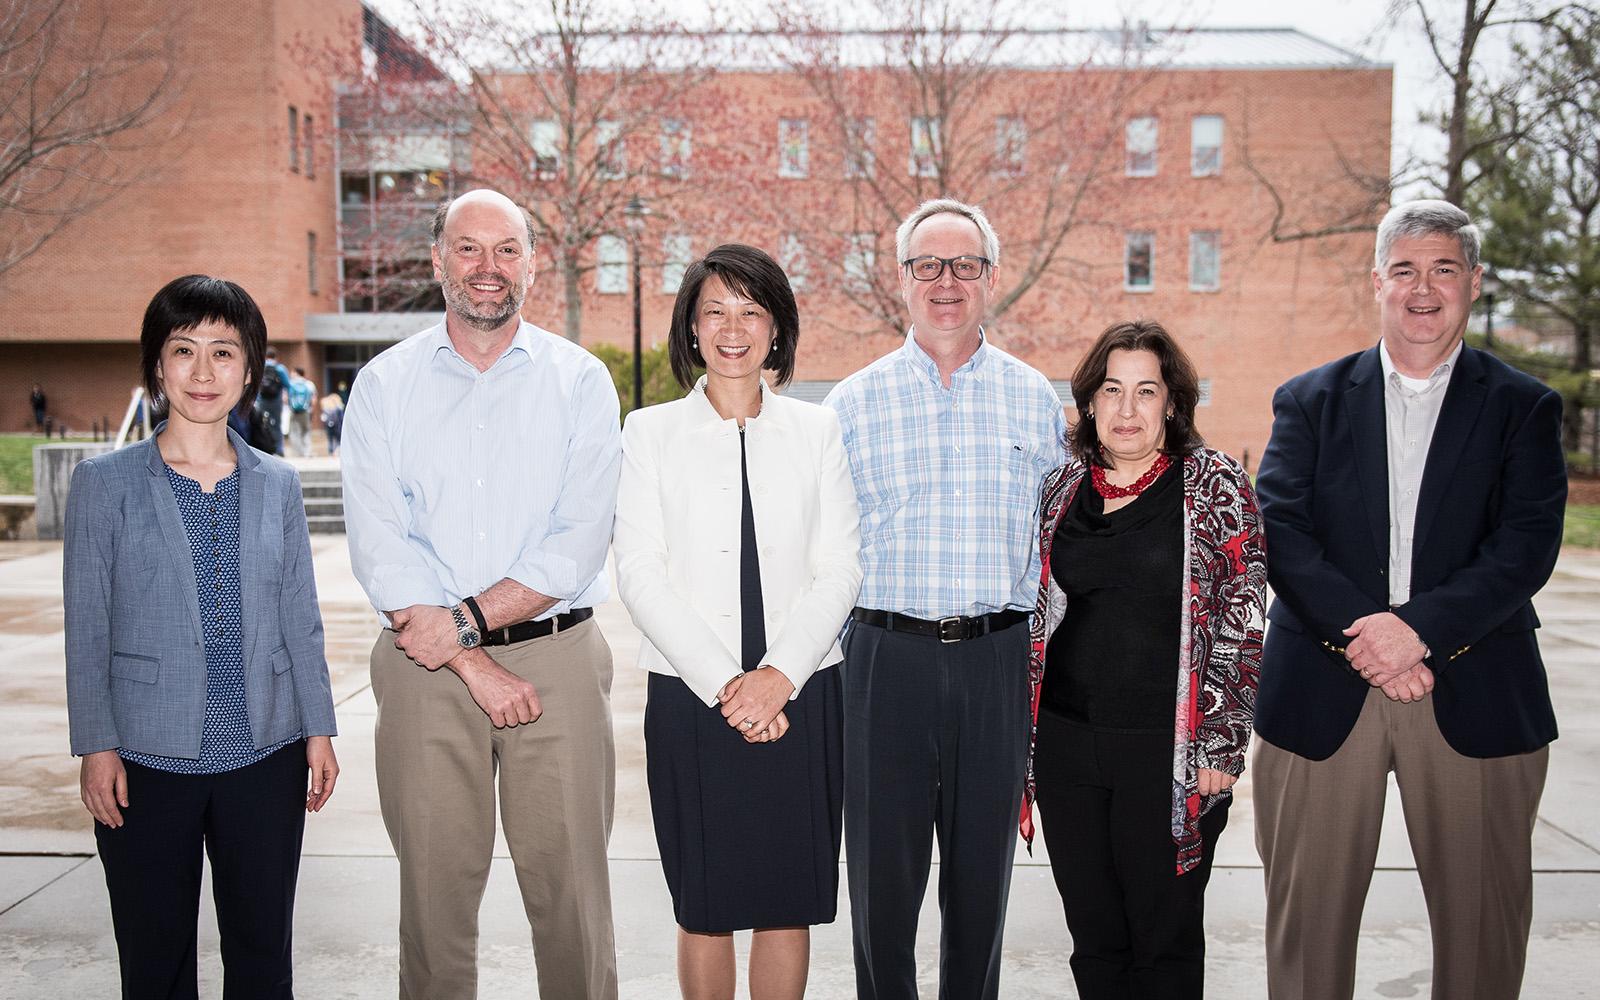 From left: Faculty award winners Xinxin Li, John Mathieu, Sulin Ba, Jan Stallaert, Nora Madjar, and David Papandria. (Nathan Oldham/UConn School of Business)